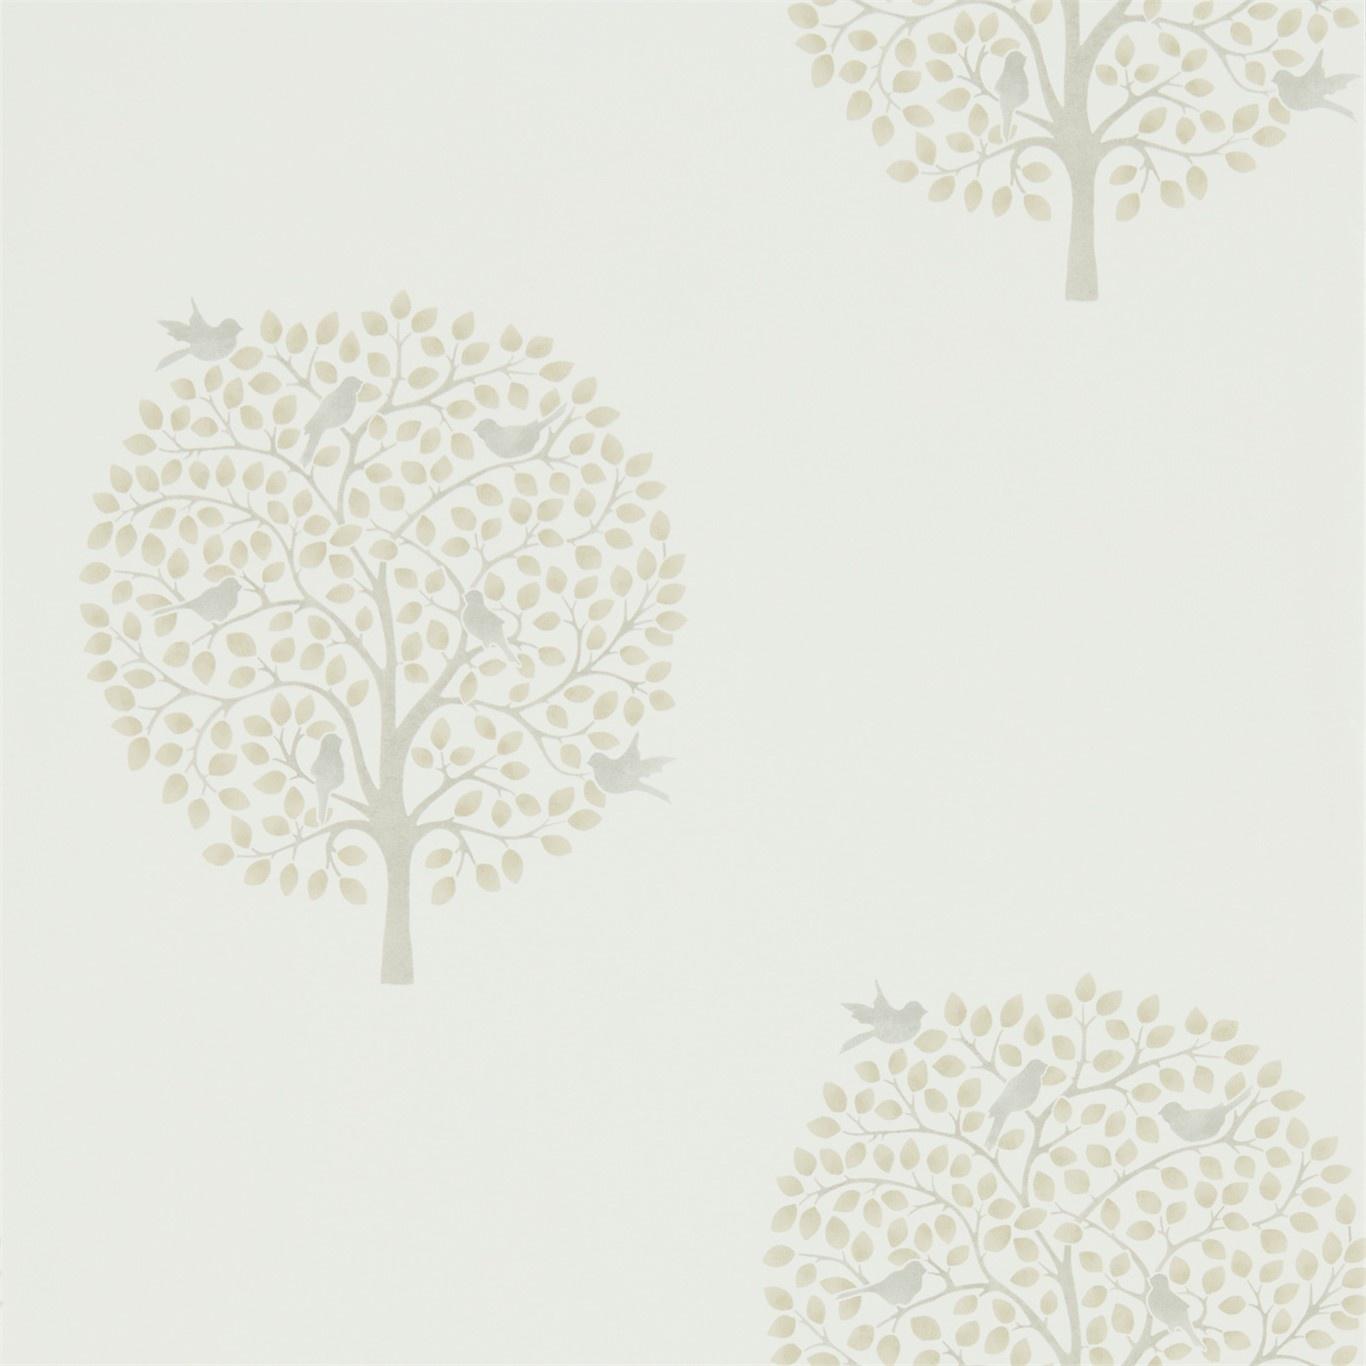 Image of Sanderson Home Bay Tree Linen/Dove Wallpaper 216362